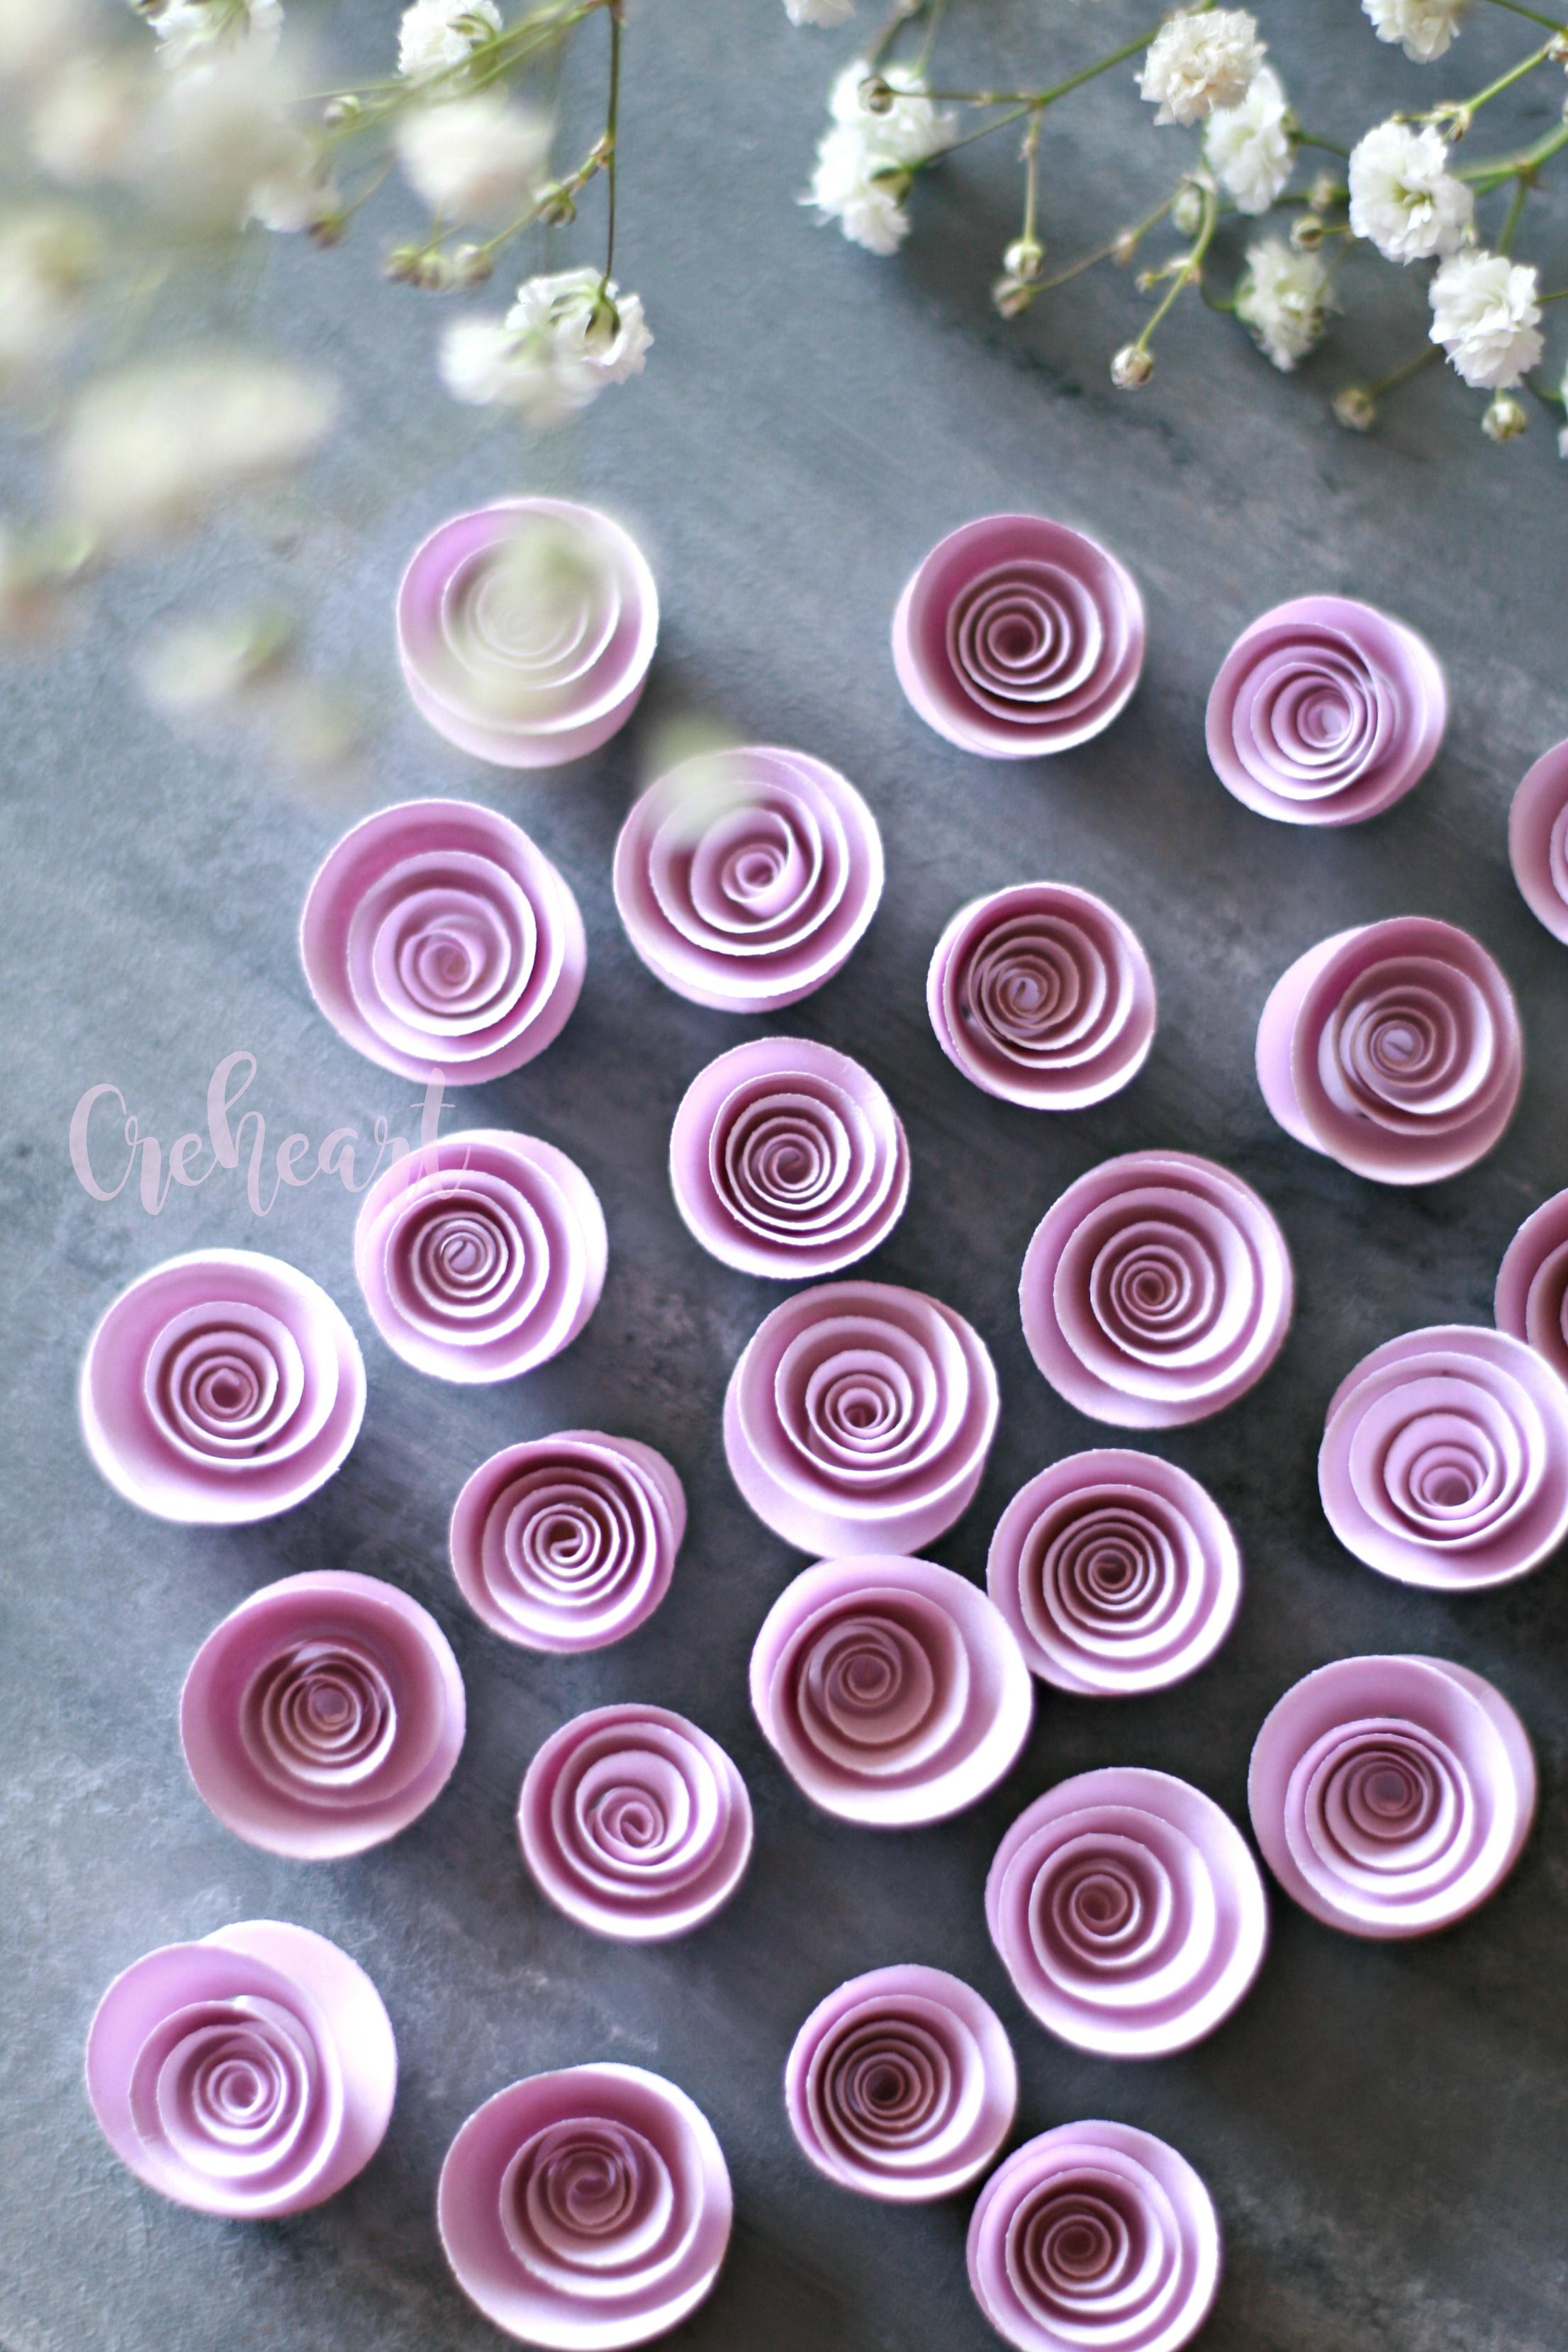 Lilac Roses Creheart Magnolia.jpg